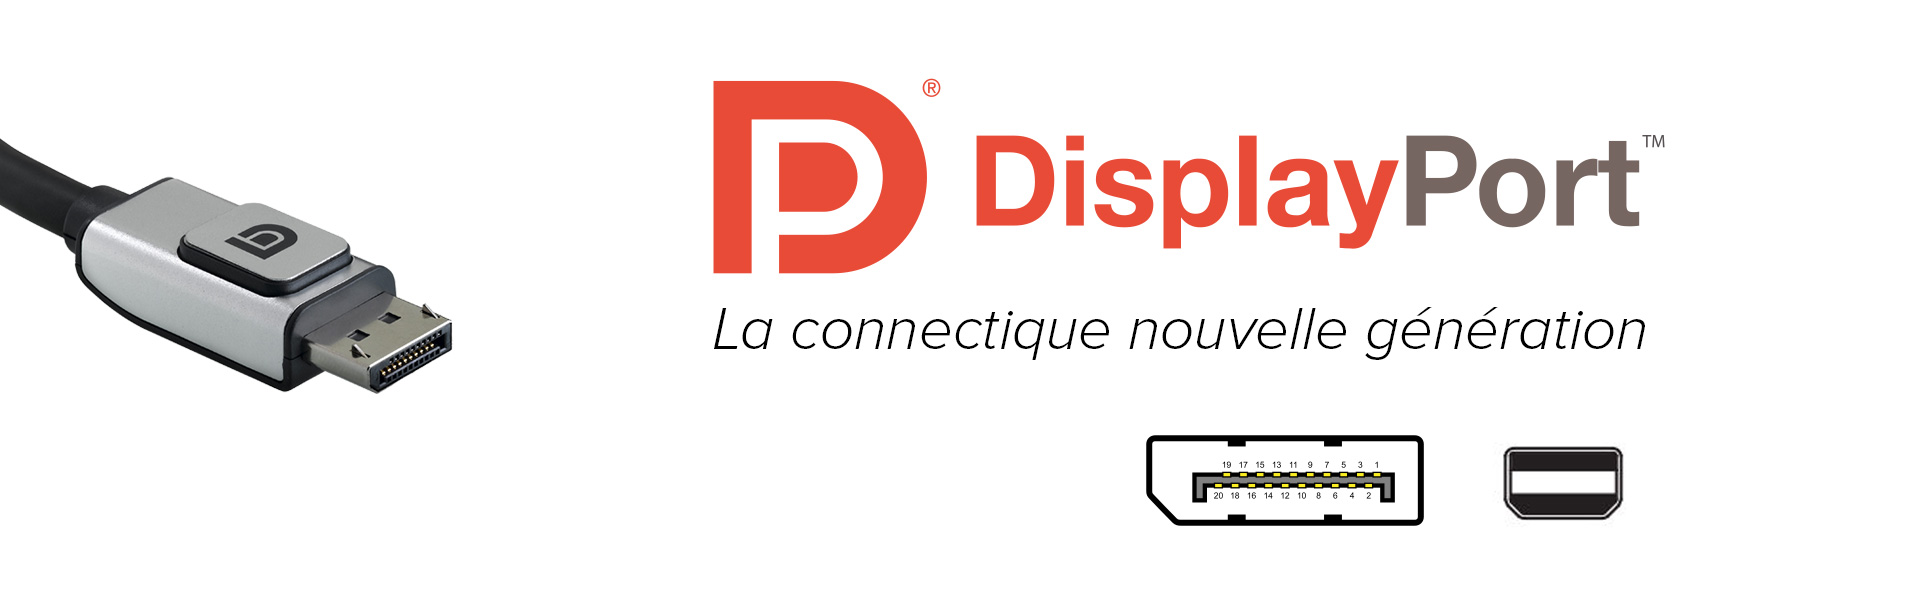 banniere-dp-trade-discount-